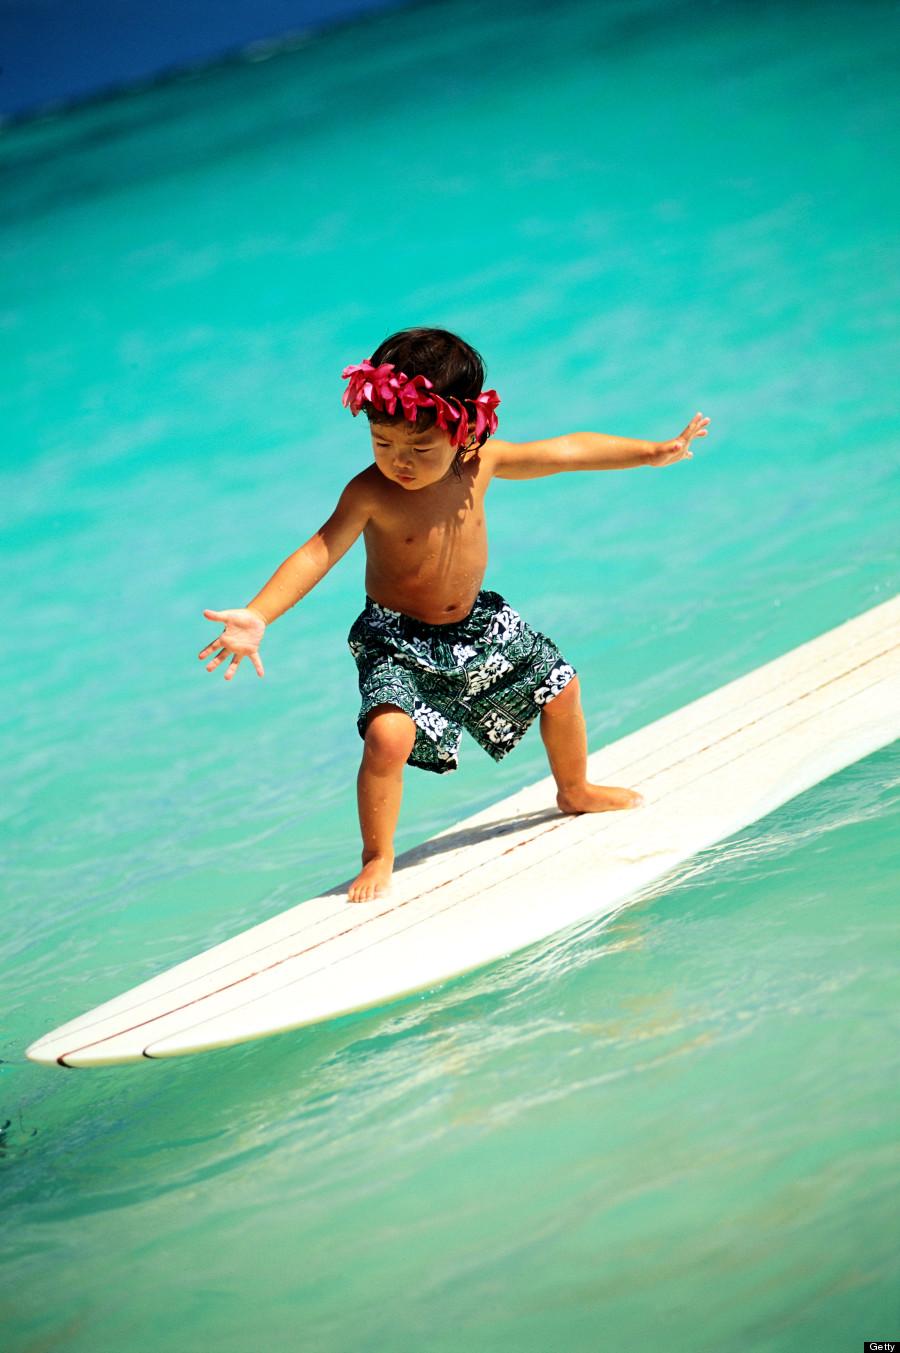 o-SURFING-CHILD-900